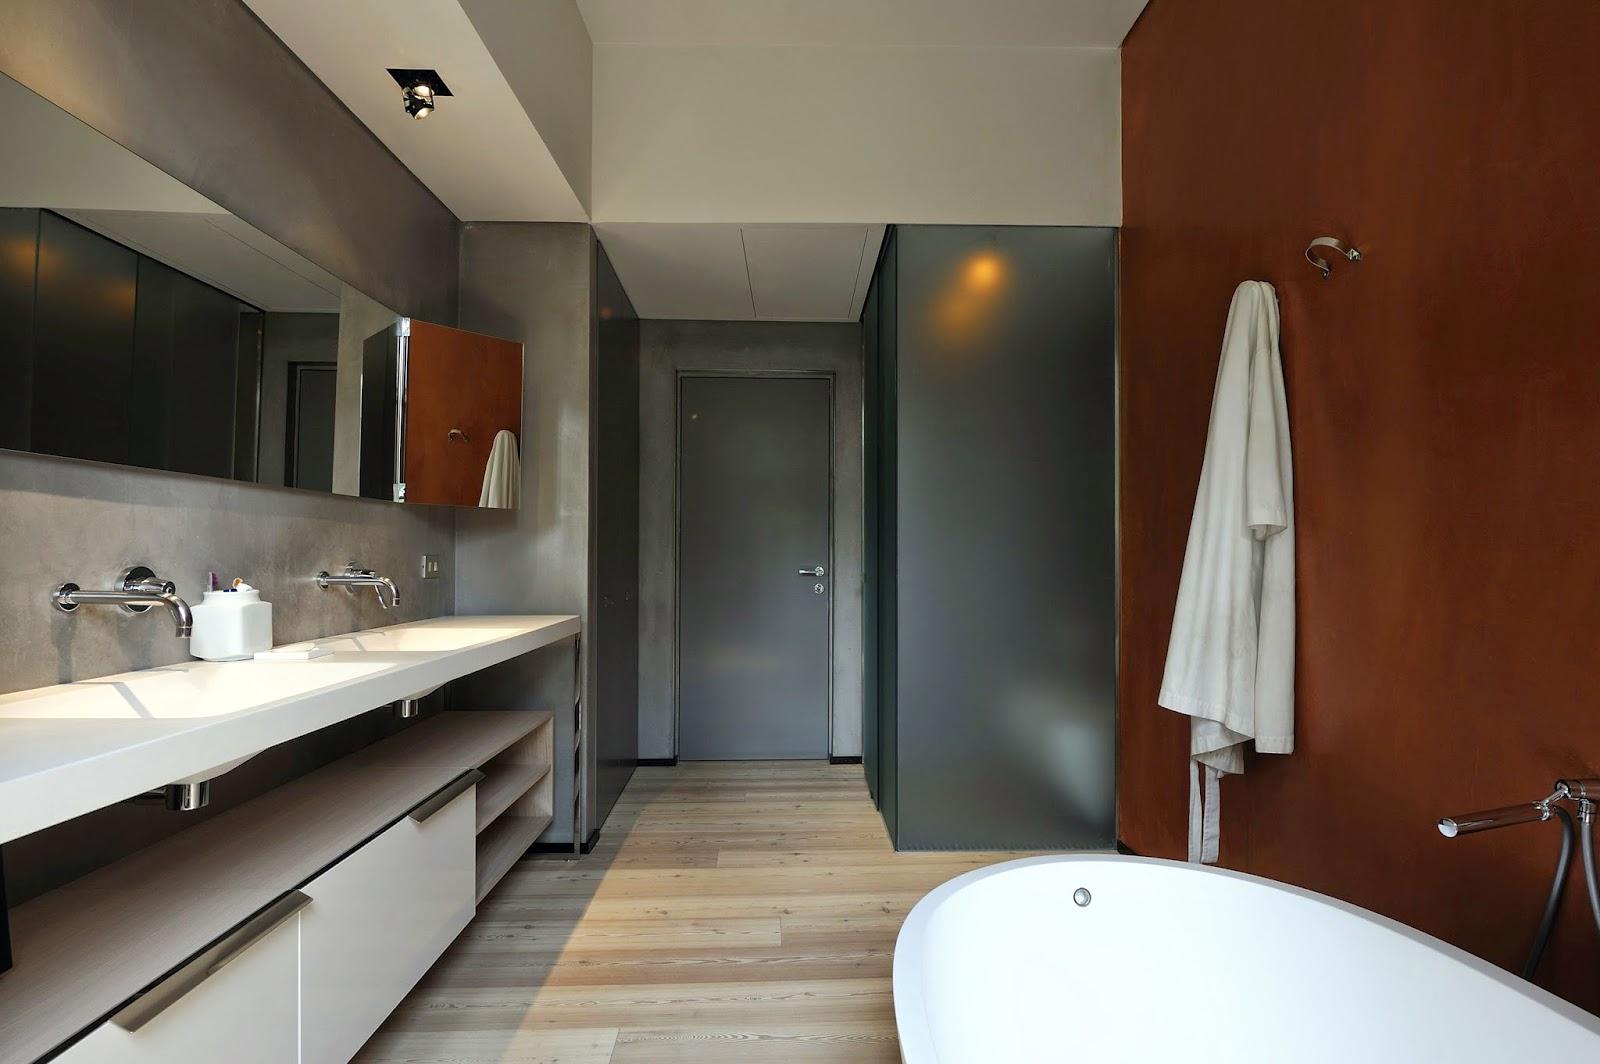 online bathroom remodeling cost estimator